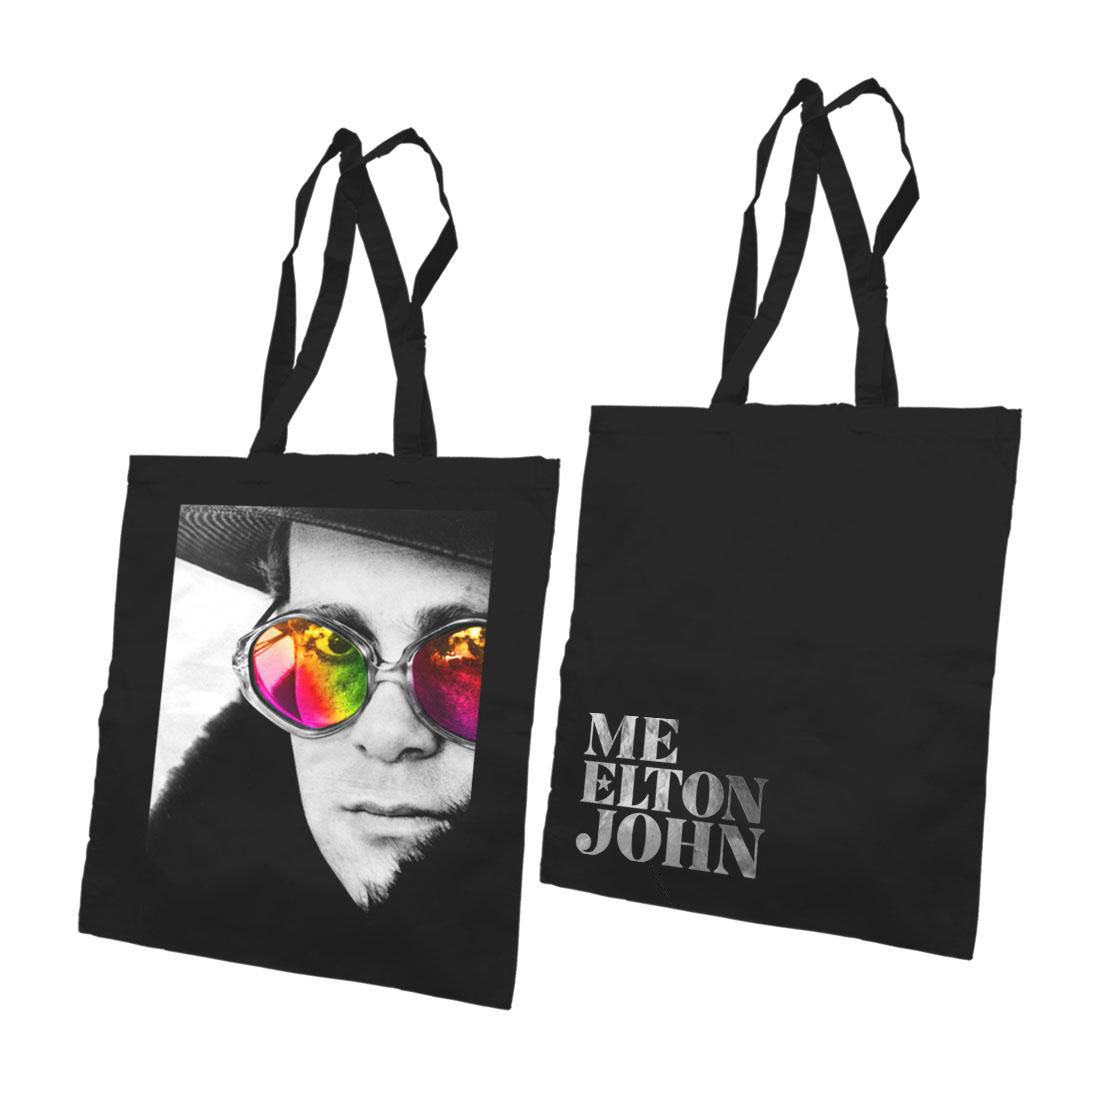 Elton John: ME' Tote Bag